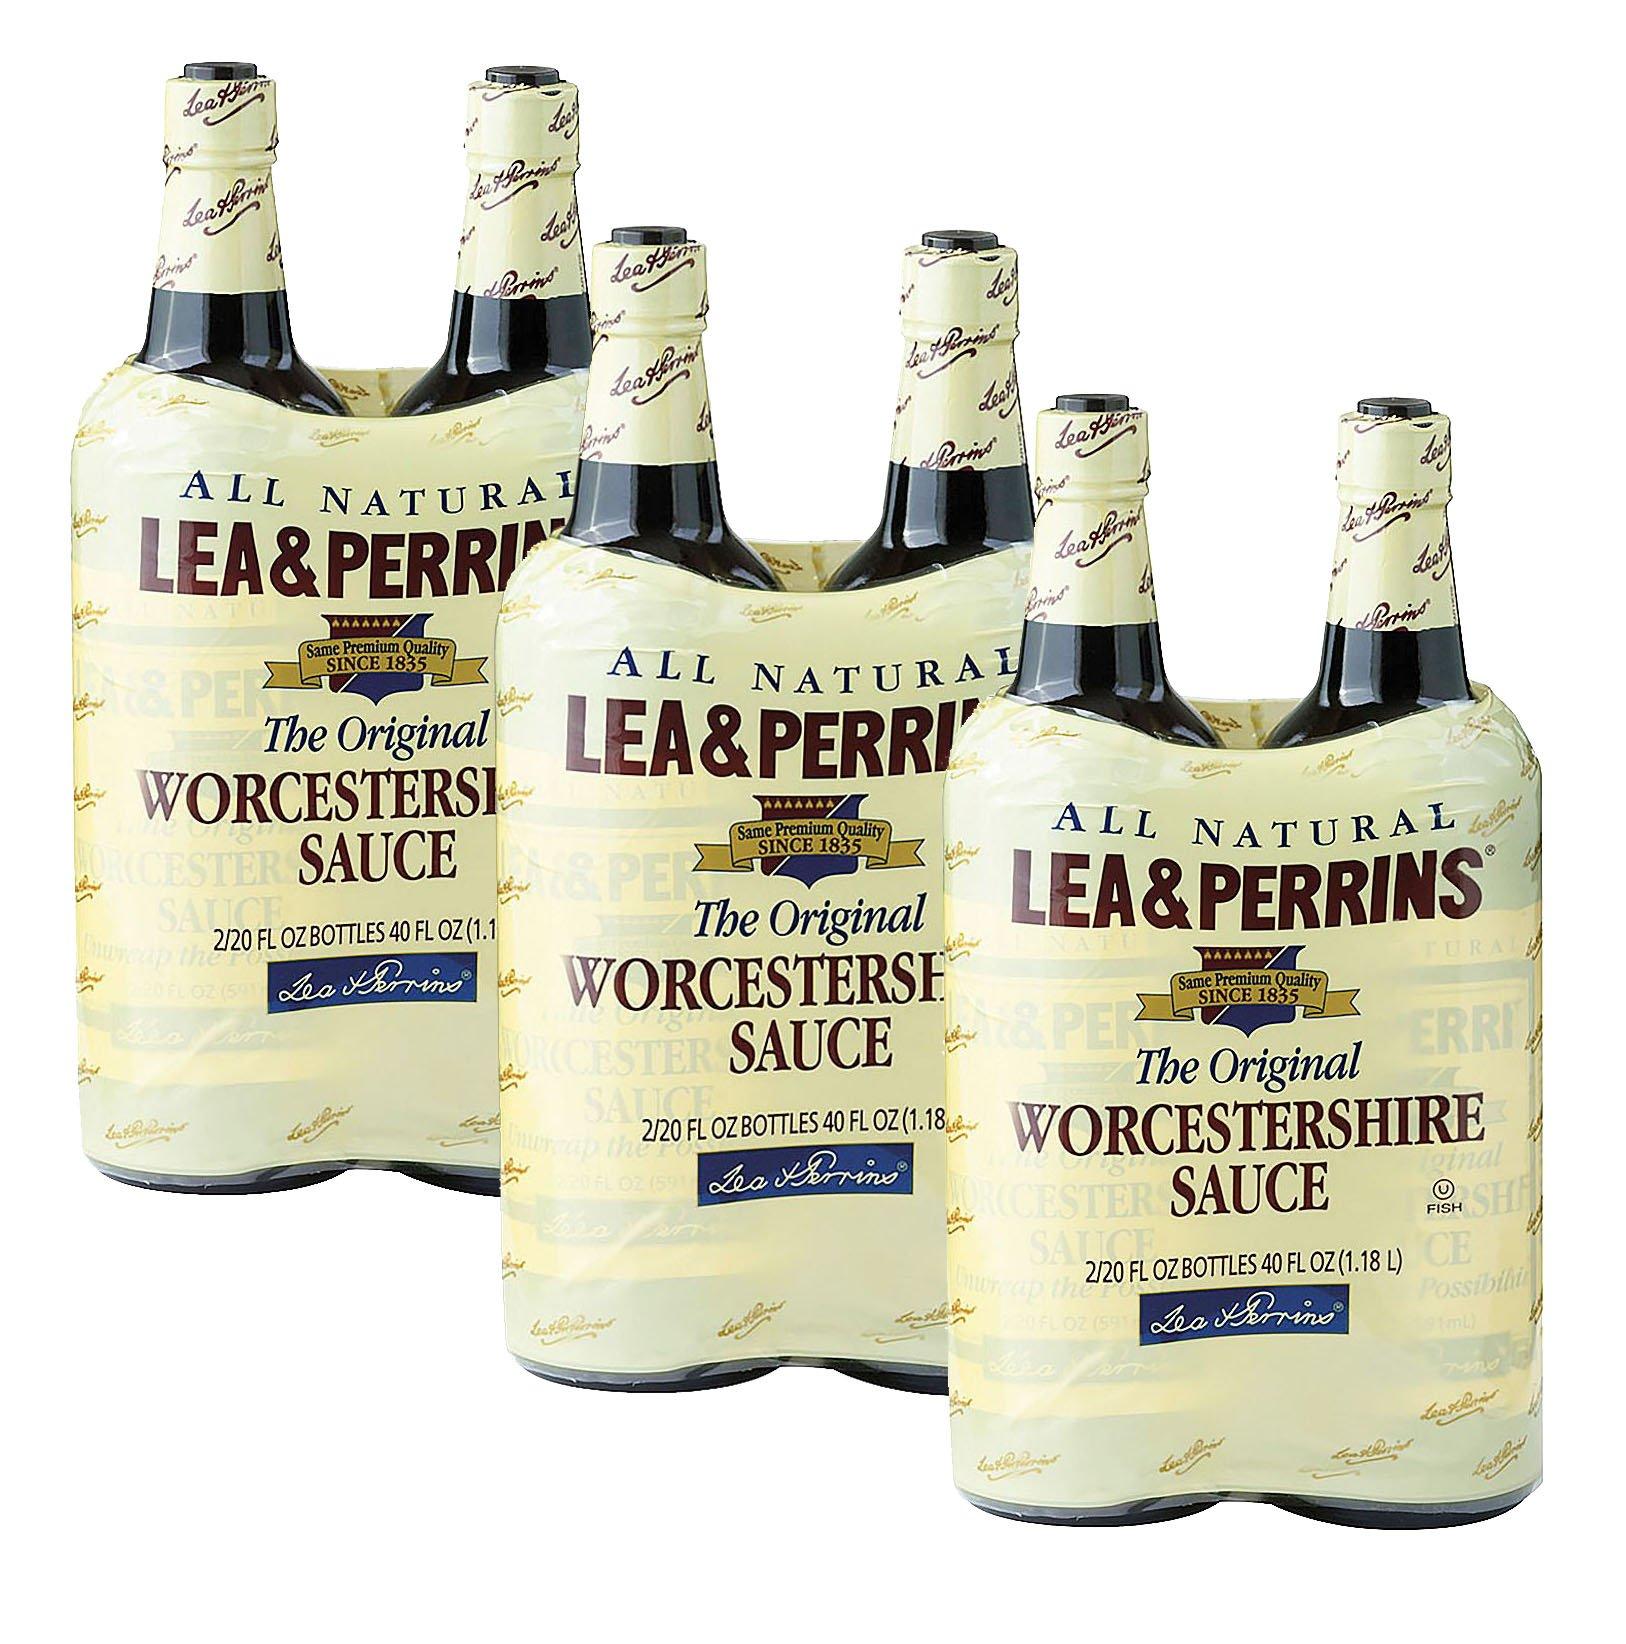 Lea & Perrins Worcestershire Sauce-20 oz, 2 ct (Pack of 3) by Lea & Perrins